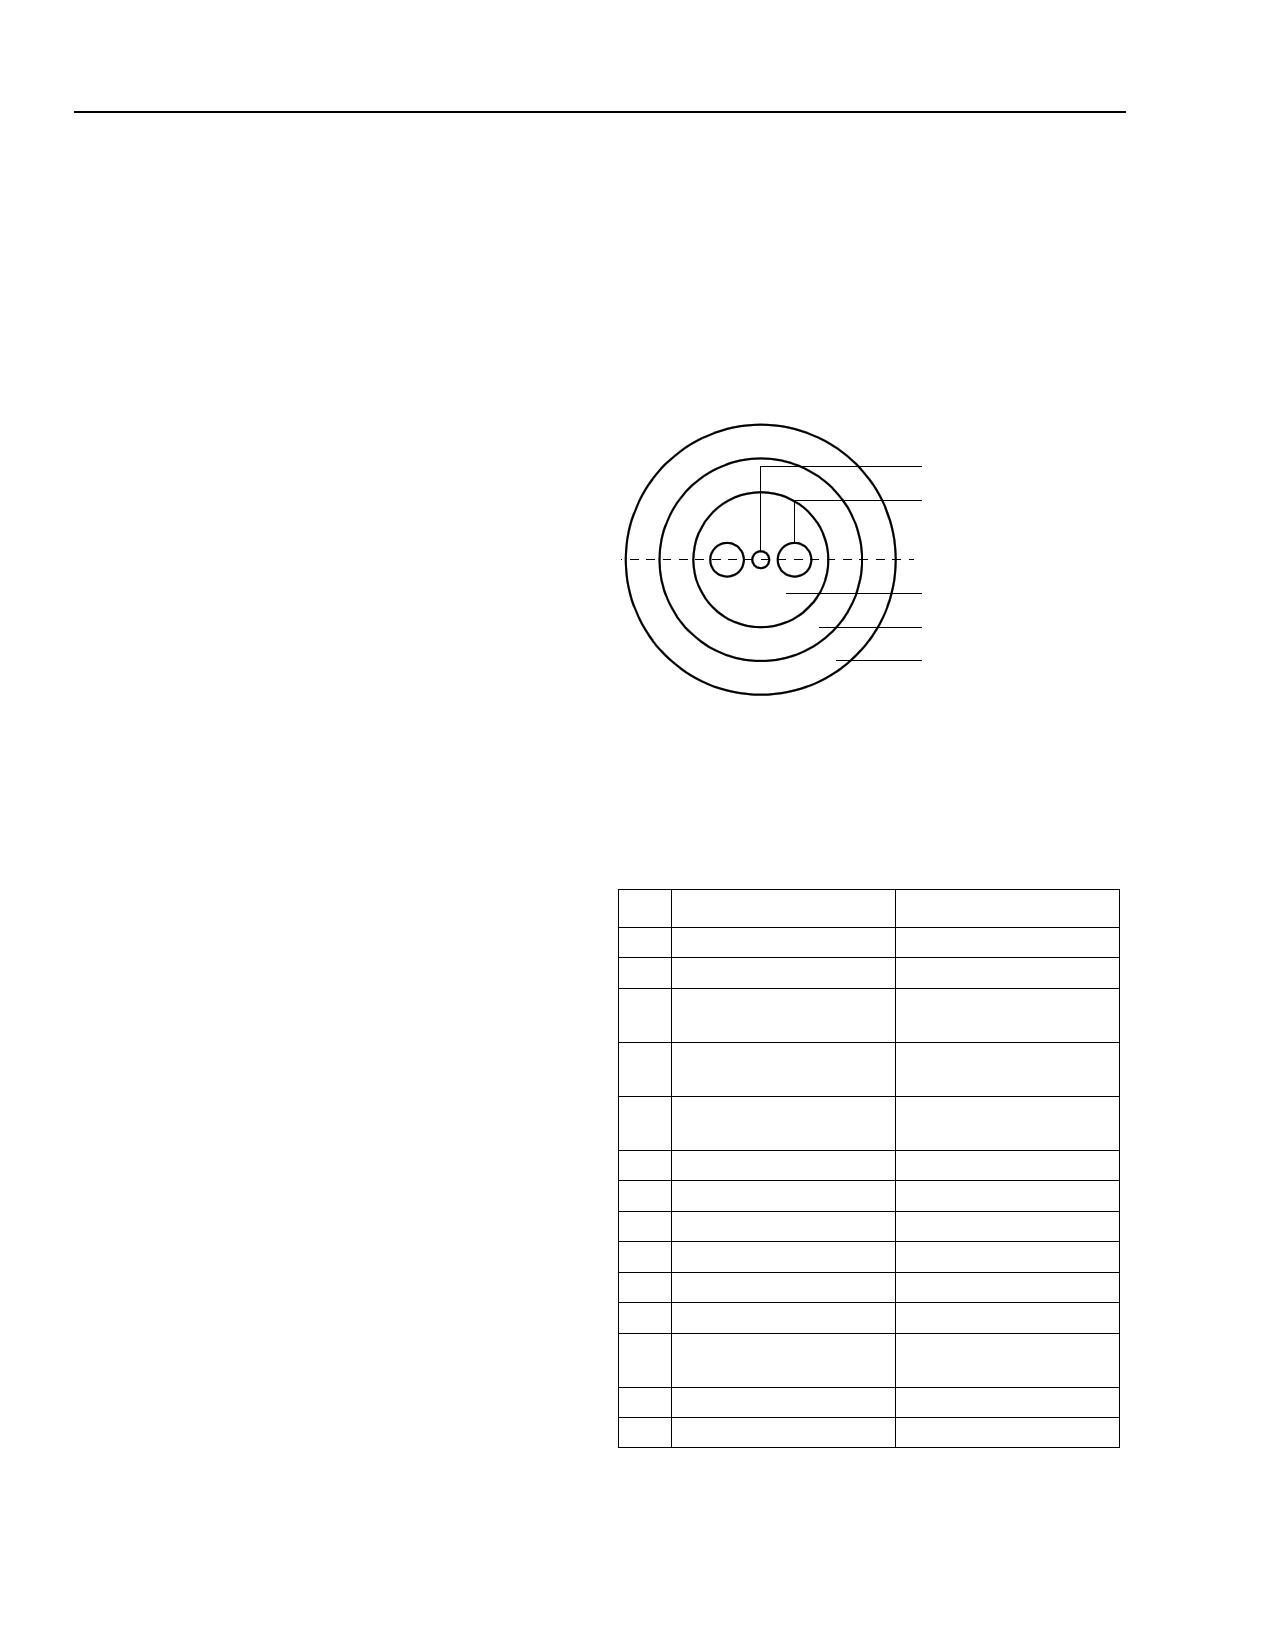 D2587P8755 pdf, schematic